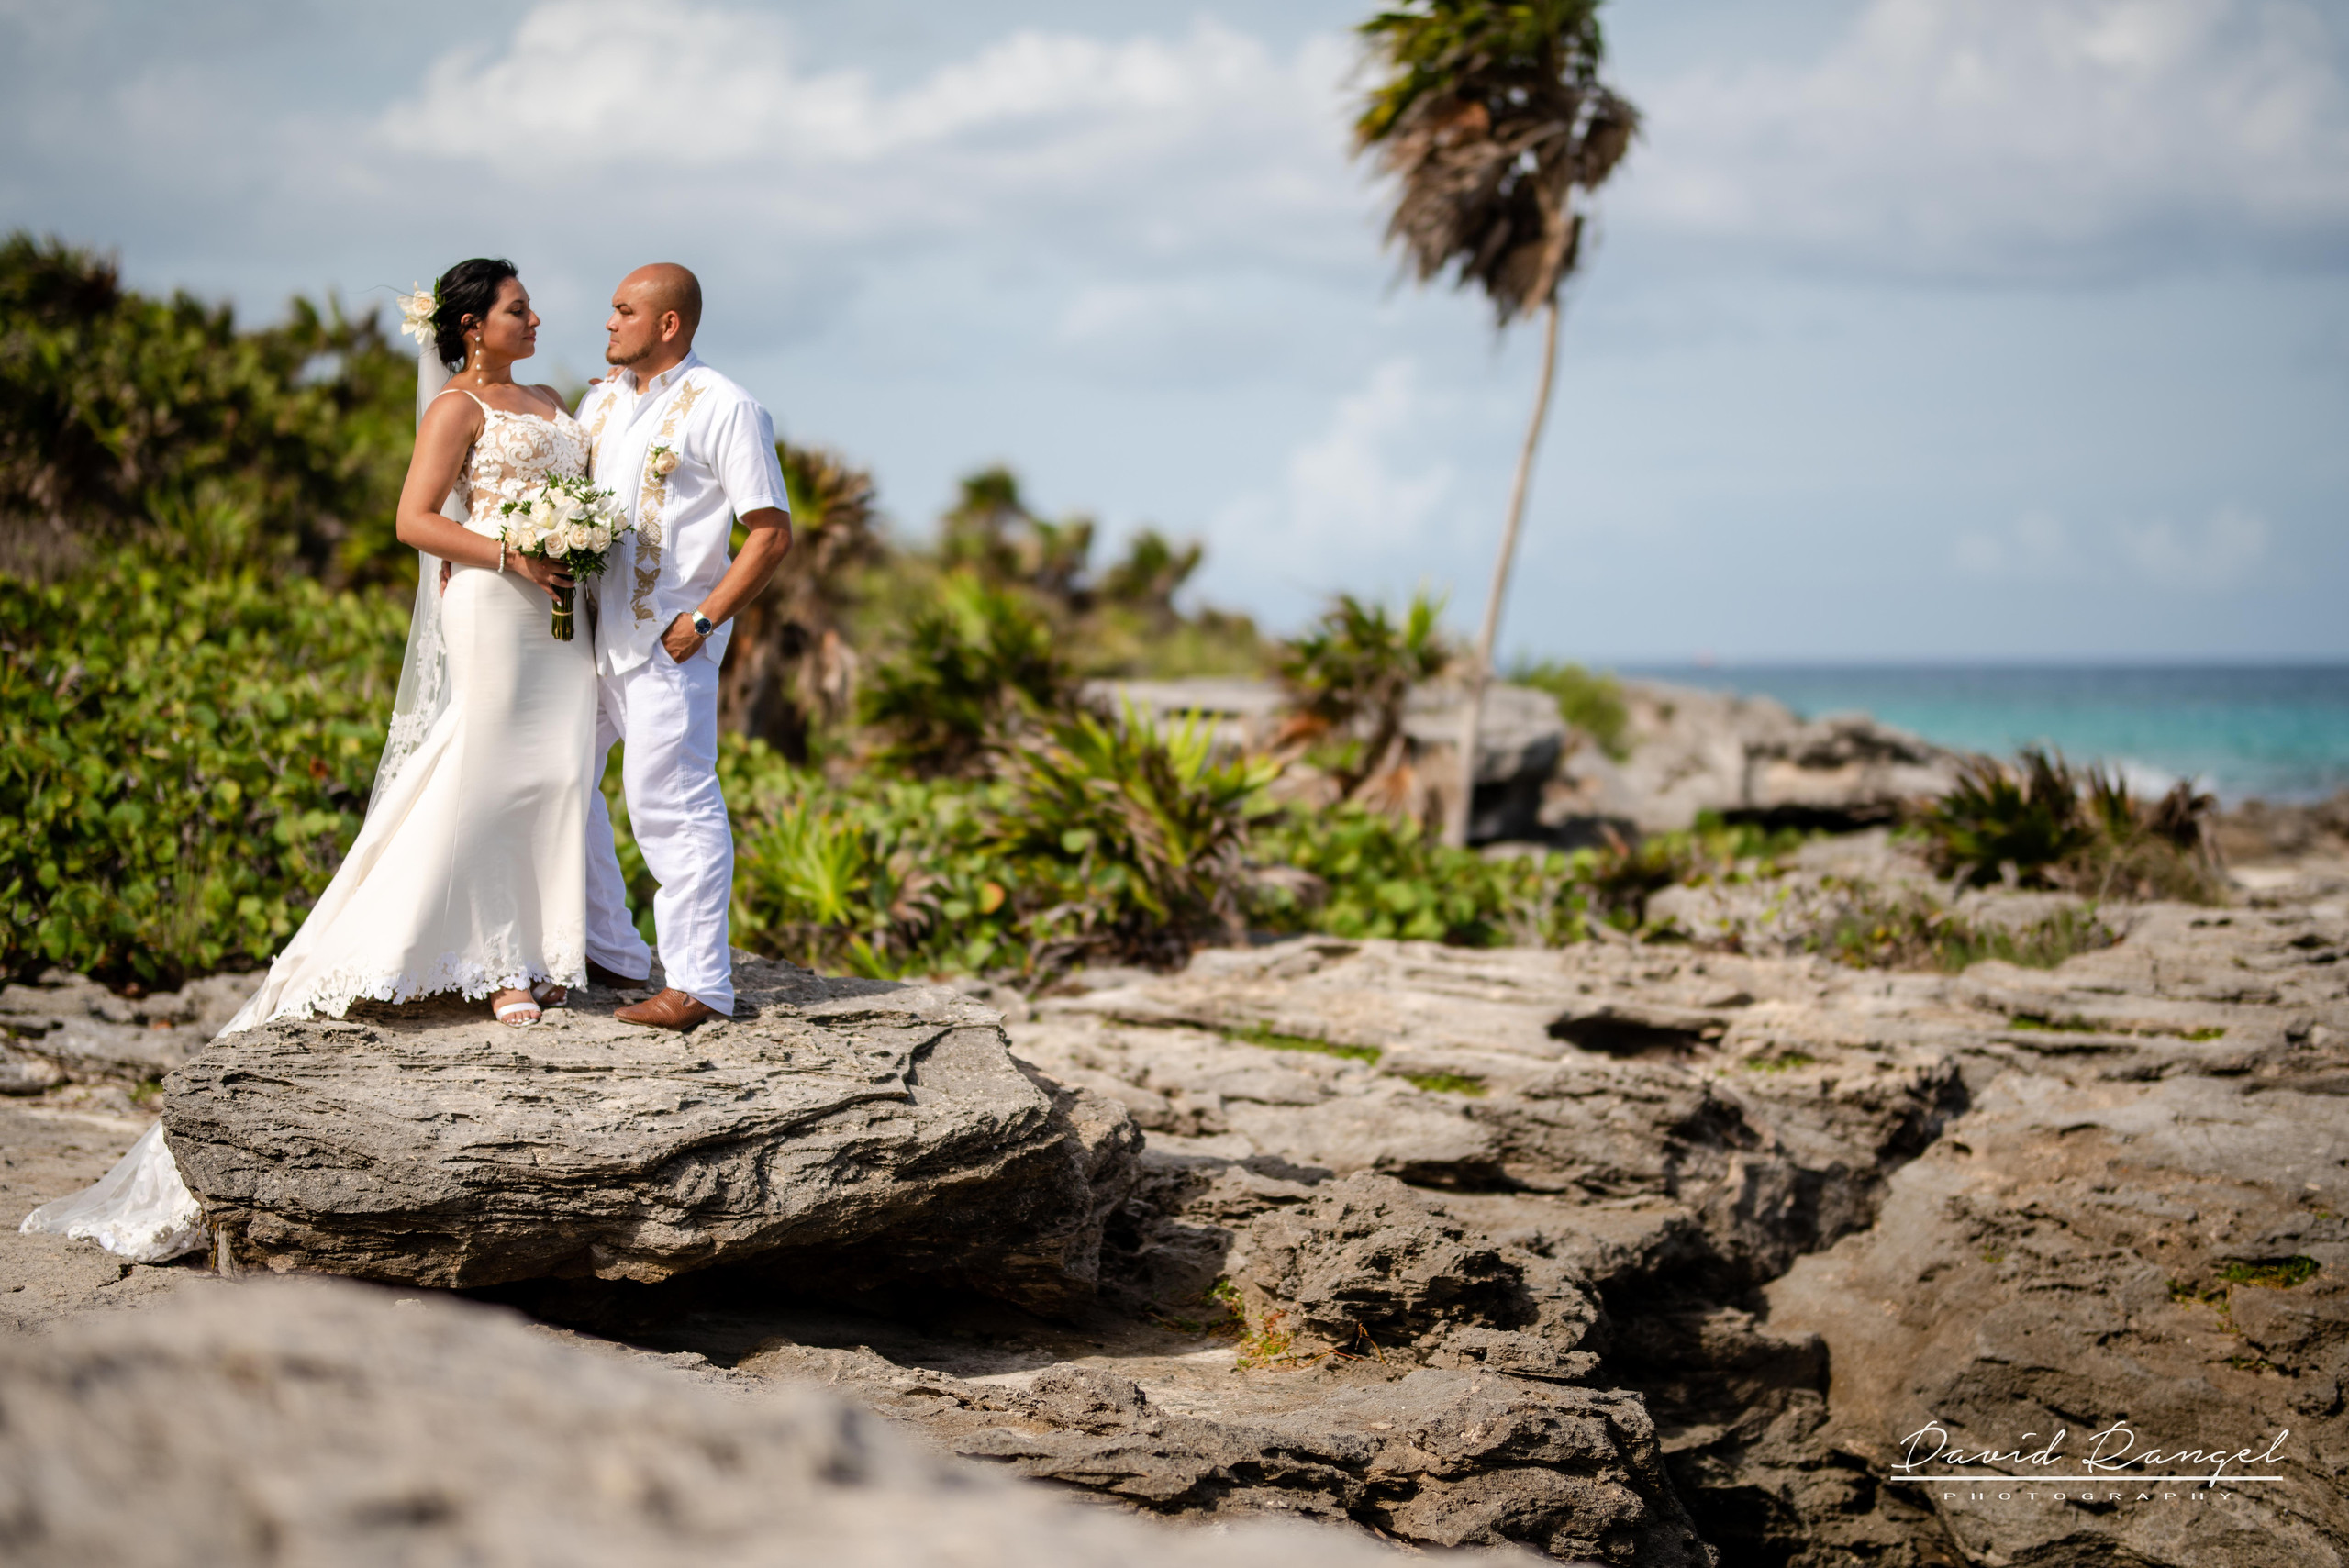 bride+groom+rocks+beach+riviera+maya+palm+trees+wedding+coverage+photo+bouquet+love+union+celebration+nature+caribean+sea